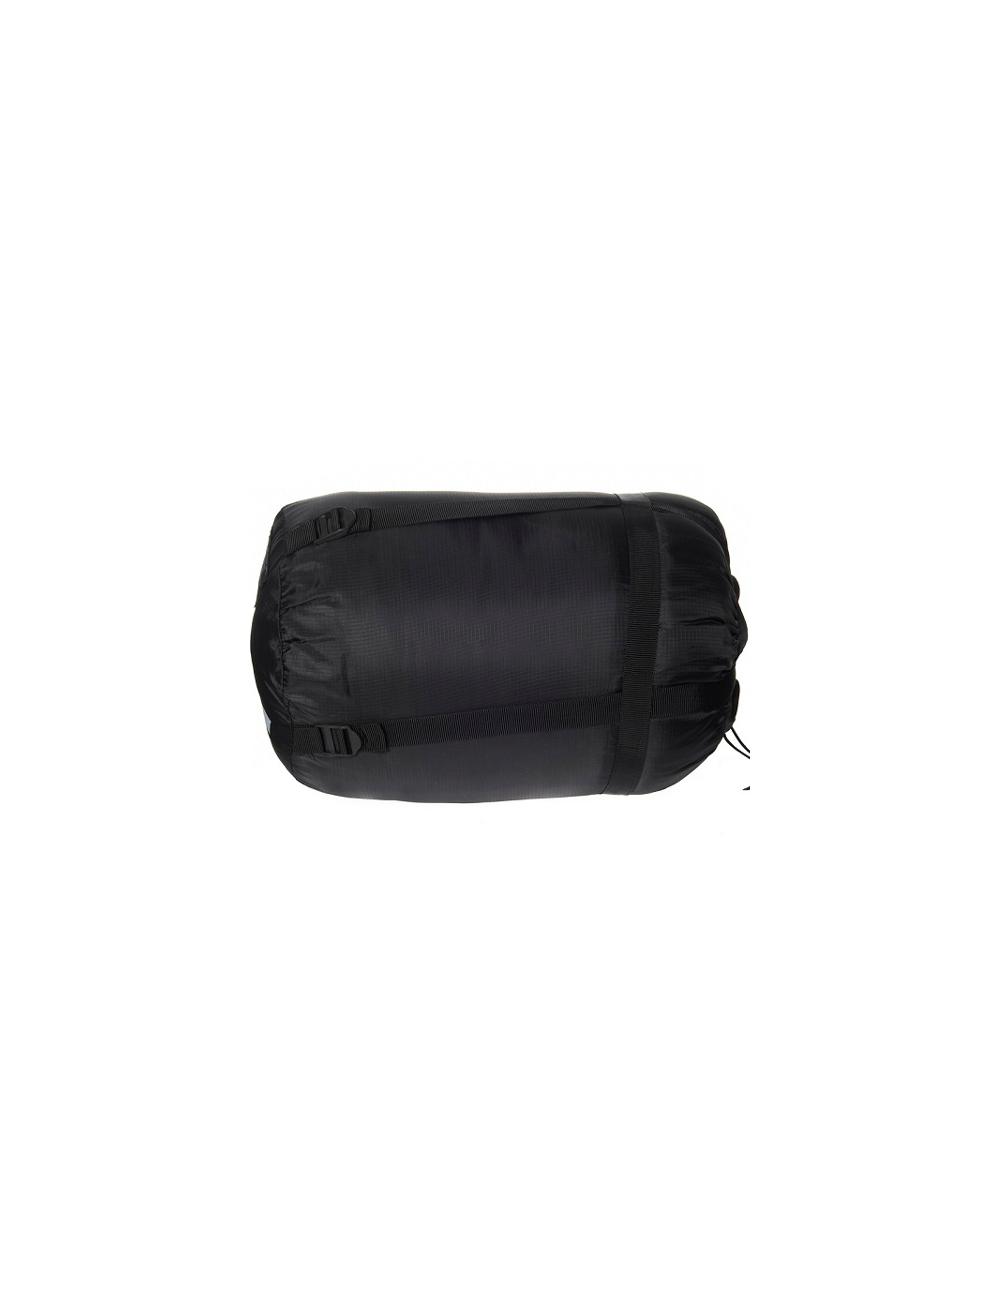 Fostex mummyslaapzak Tactical Sniper 230 cm - Zwart